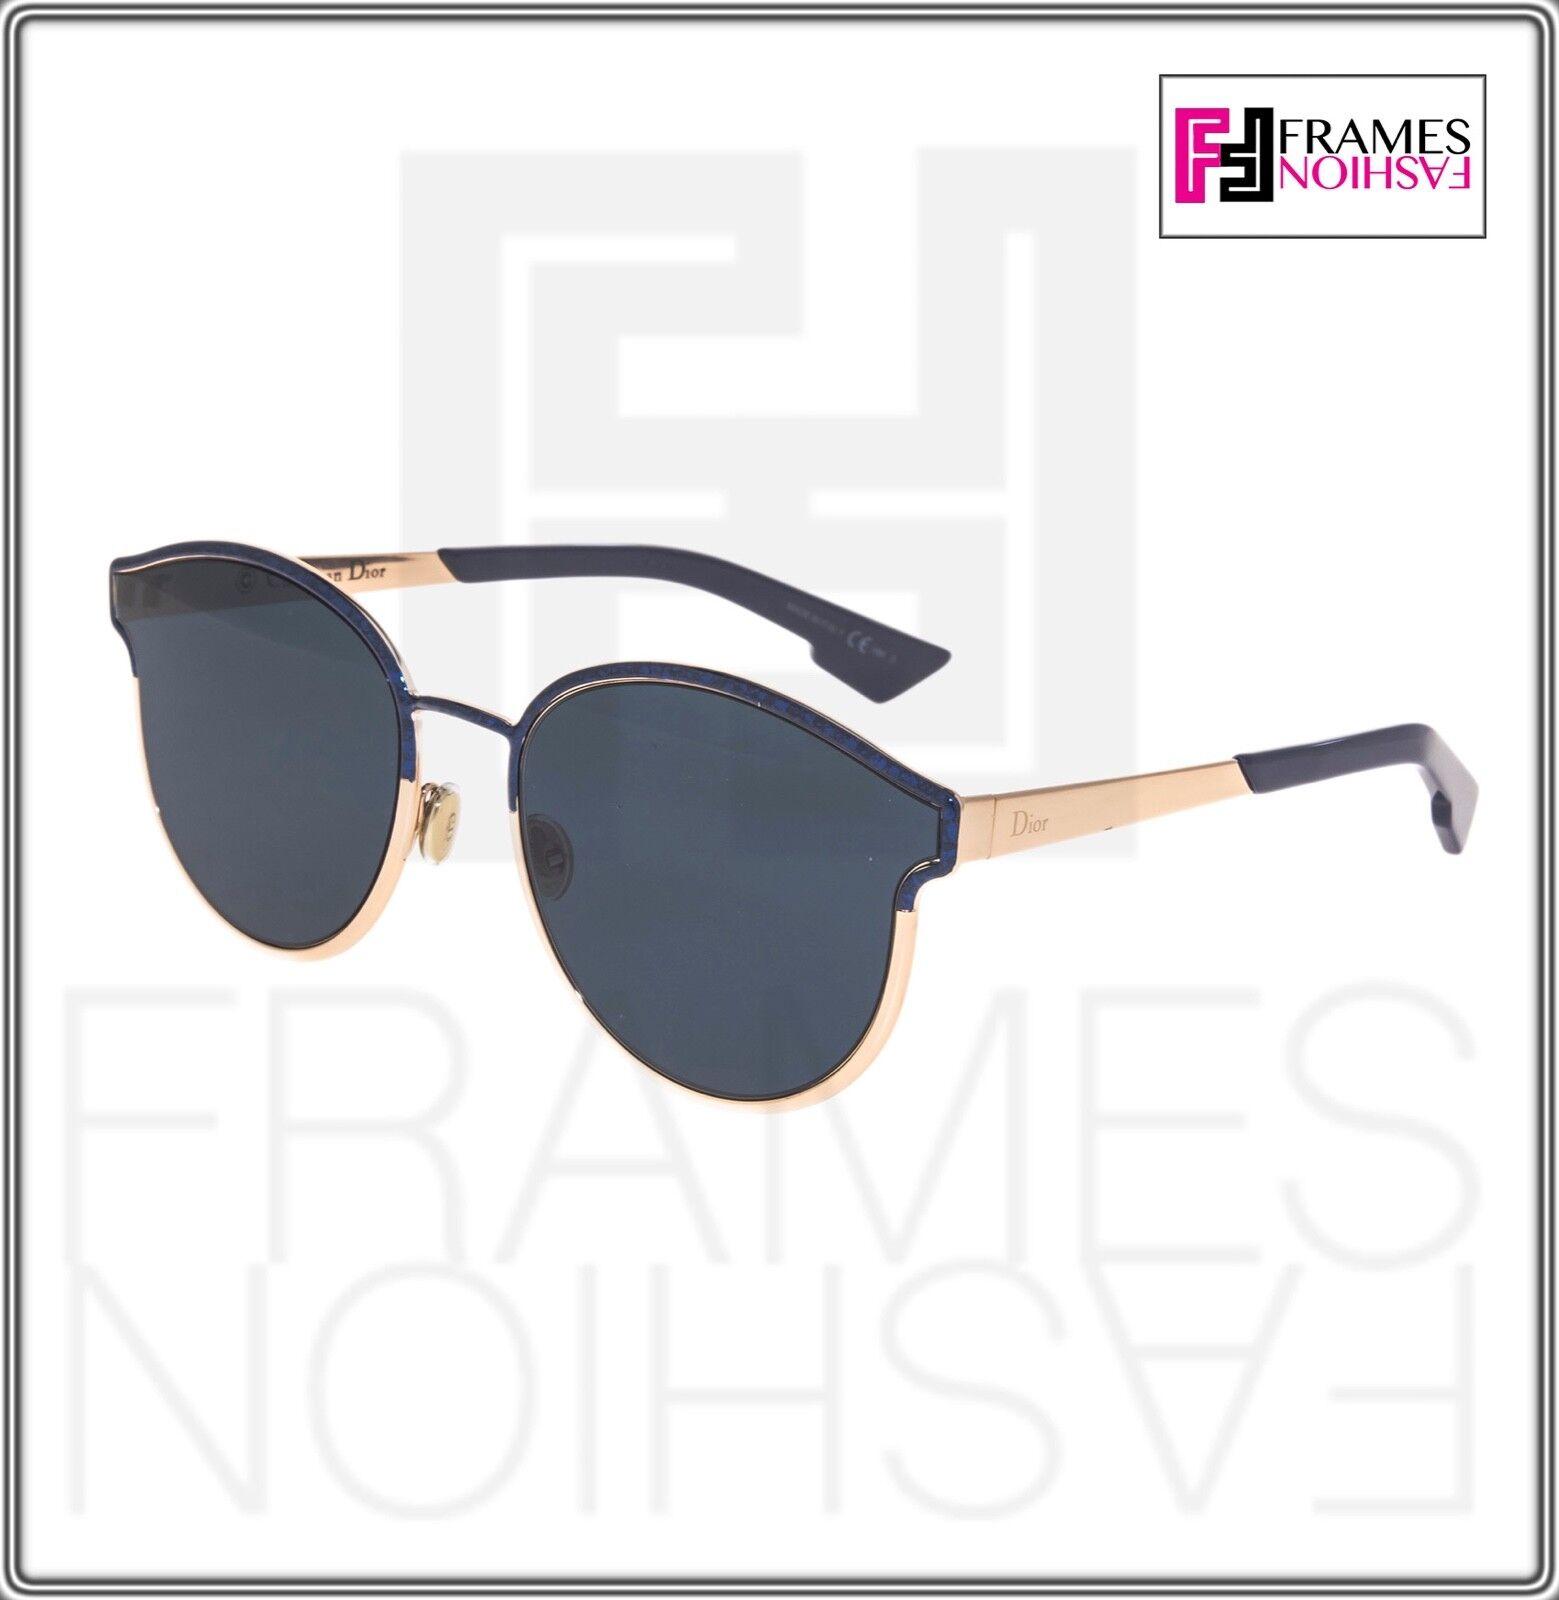 5997873f67 Christian Dior Symmetric Rose Gold Marble Blue Mirrored Sunglasses  Diorsymmetric for sale online